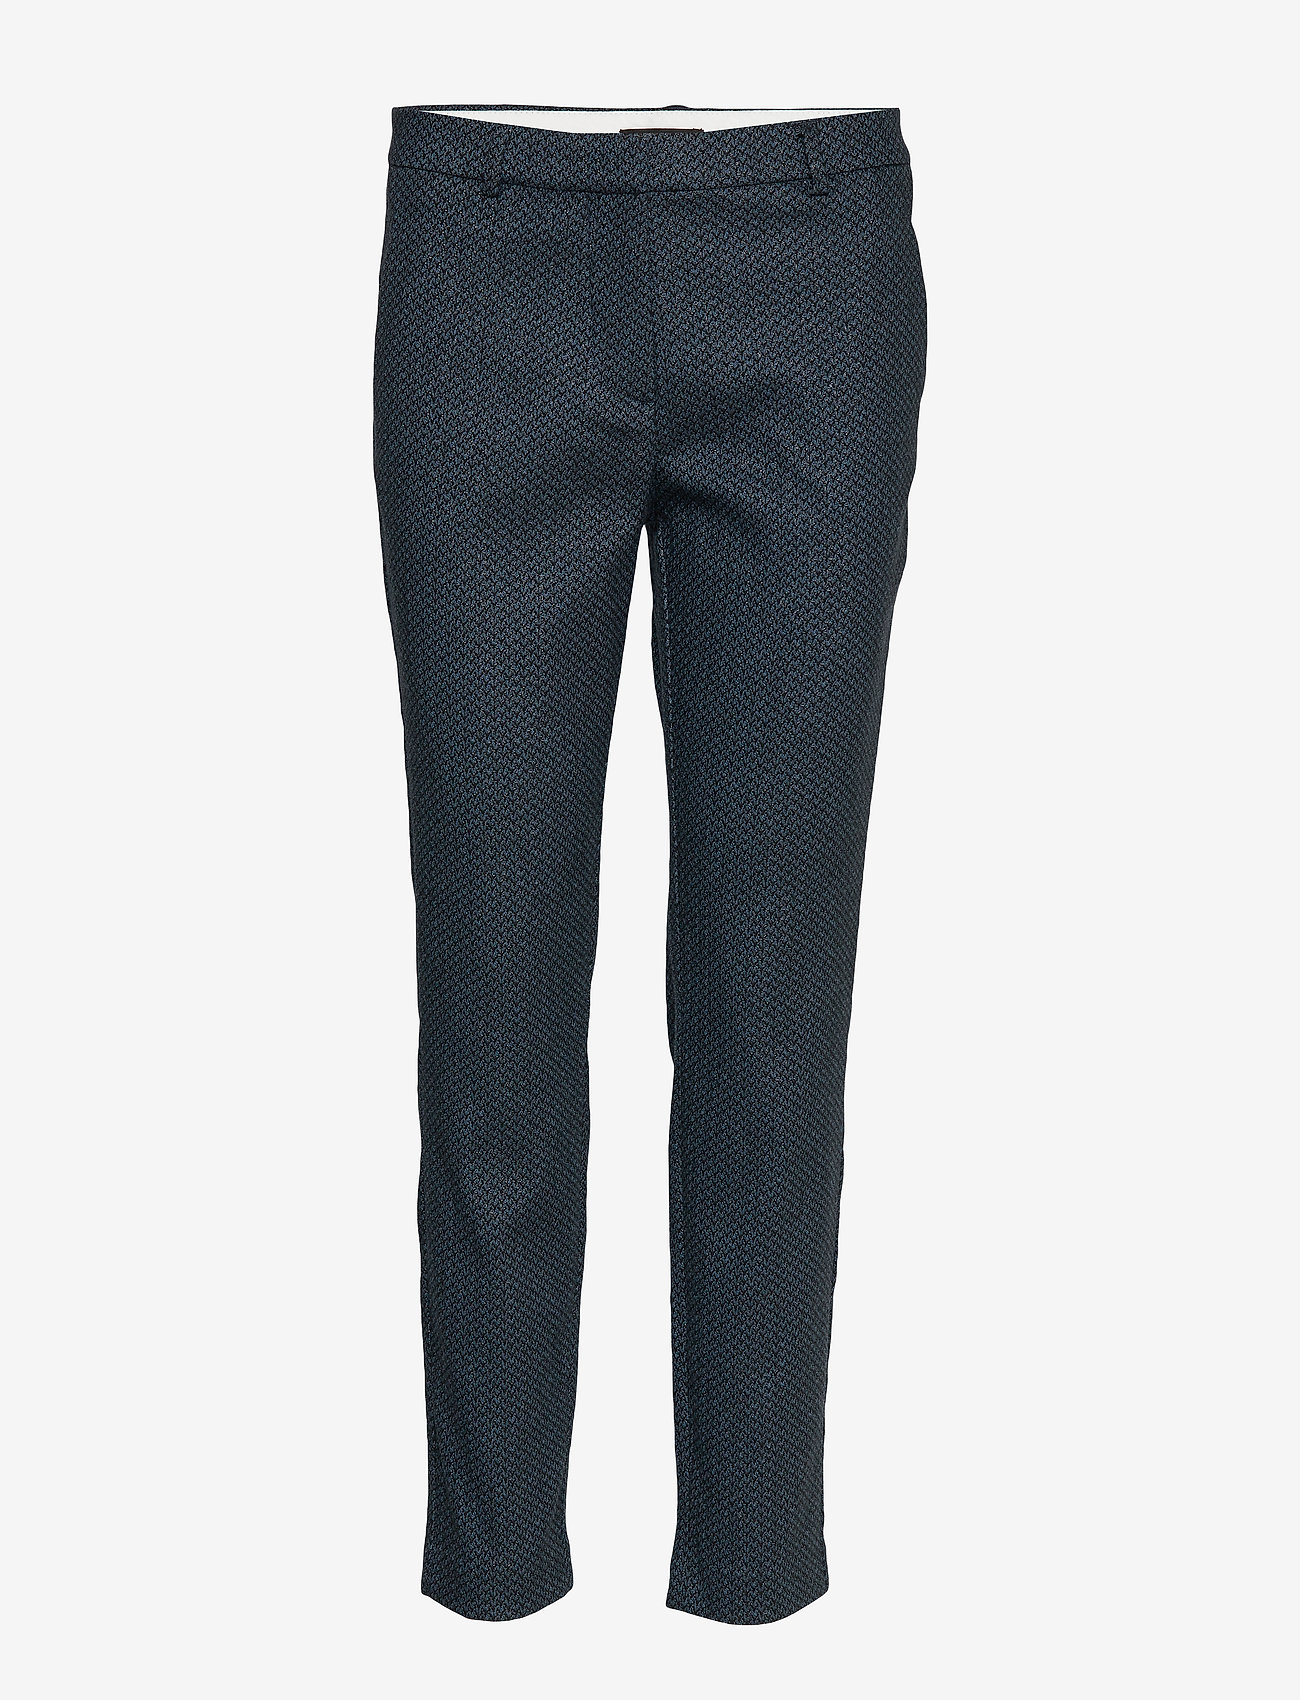 FIVEUNITS - Kylie 617 Crop - pantalons droits - navy dawny - 0